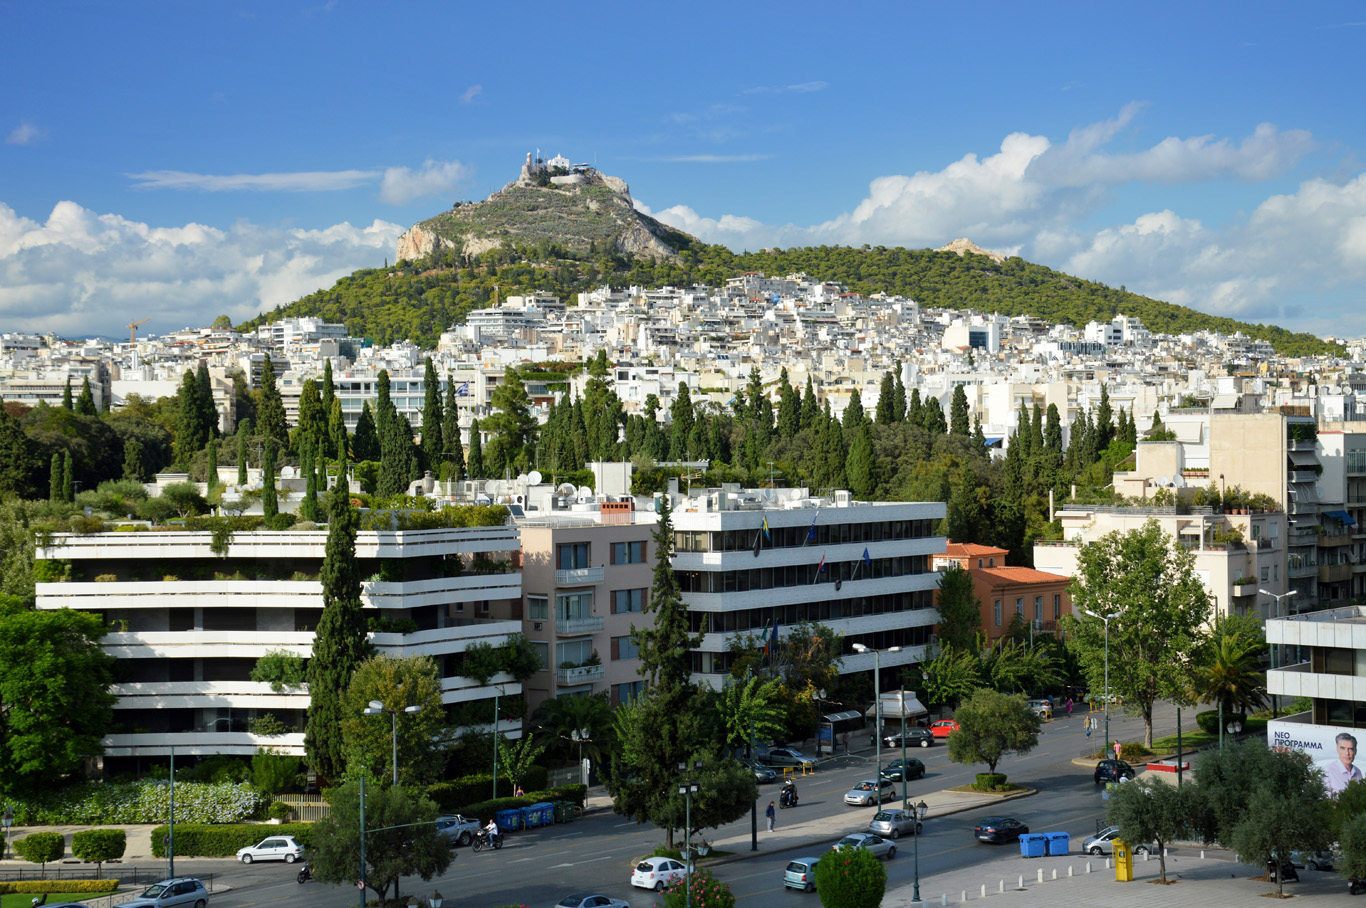 Mt. Lycabettus seen from the stadium